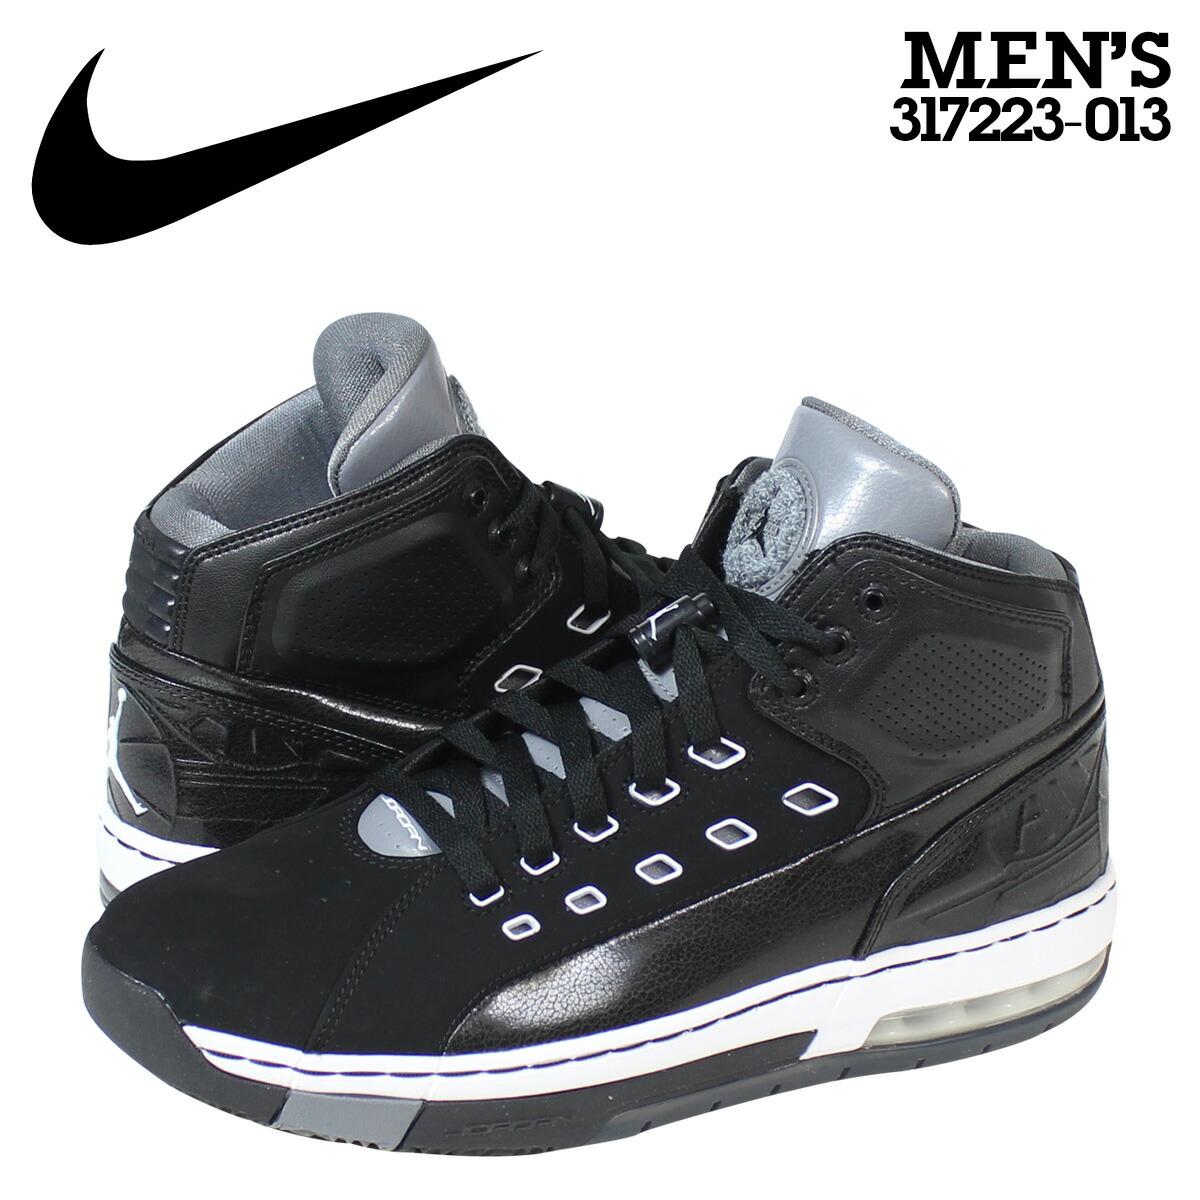 Jordan shopping online